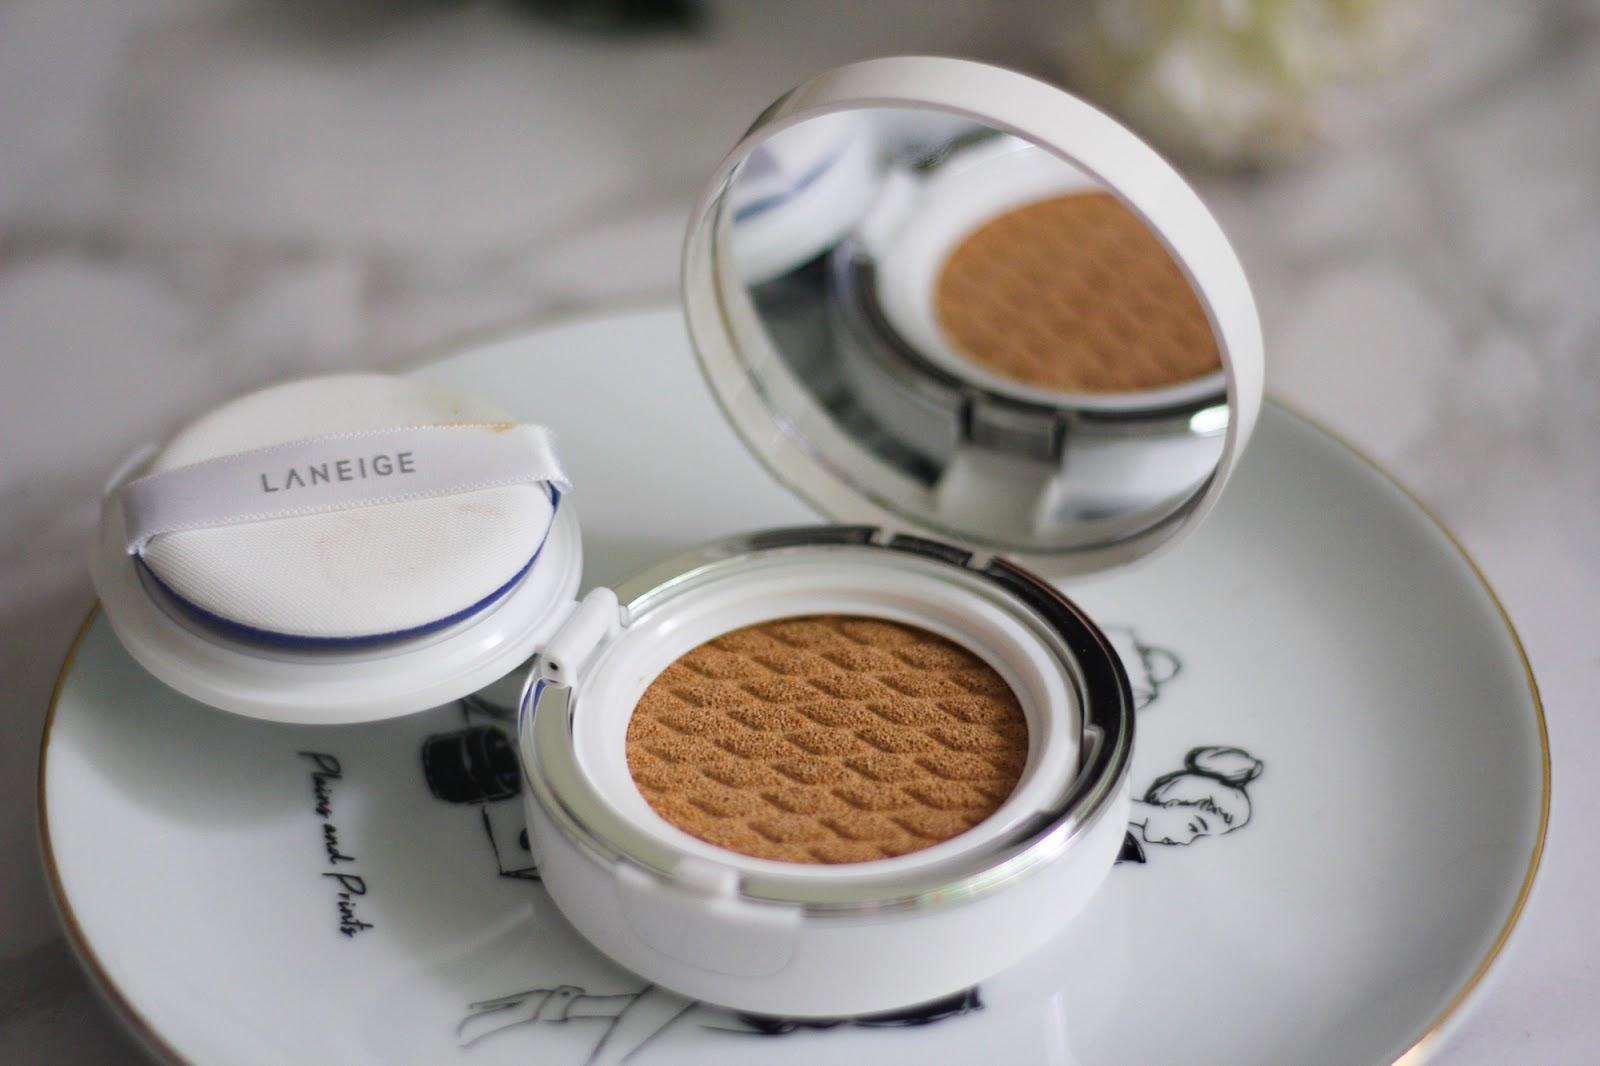 Laneige Bb Cushion Pore Control Review Shade Sand 23 New Maria Hazel